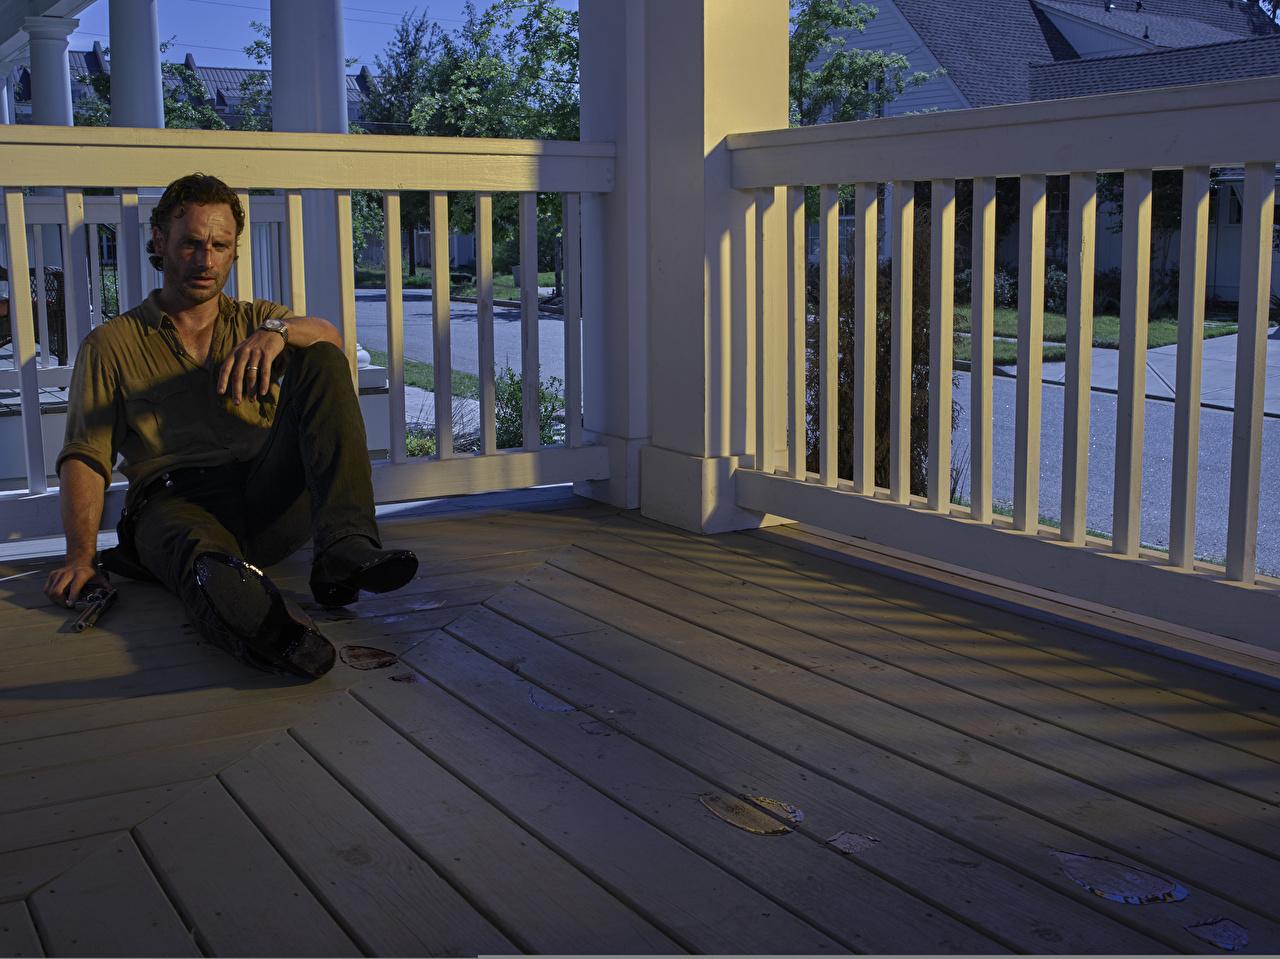 Wallpaper The Walking Dead TV Andrew Lincoln Men Rick Grimes Movies sit Celebrities Man film Sitting